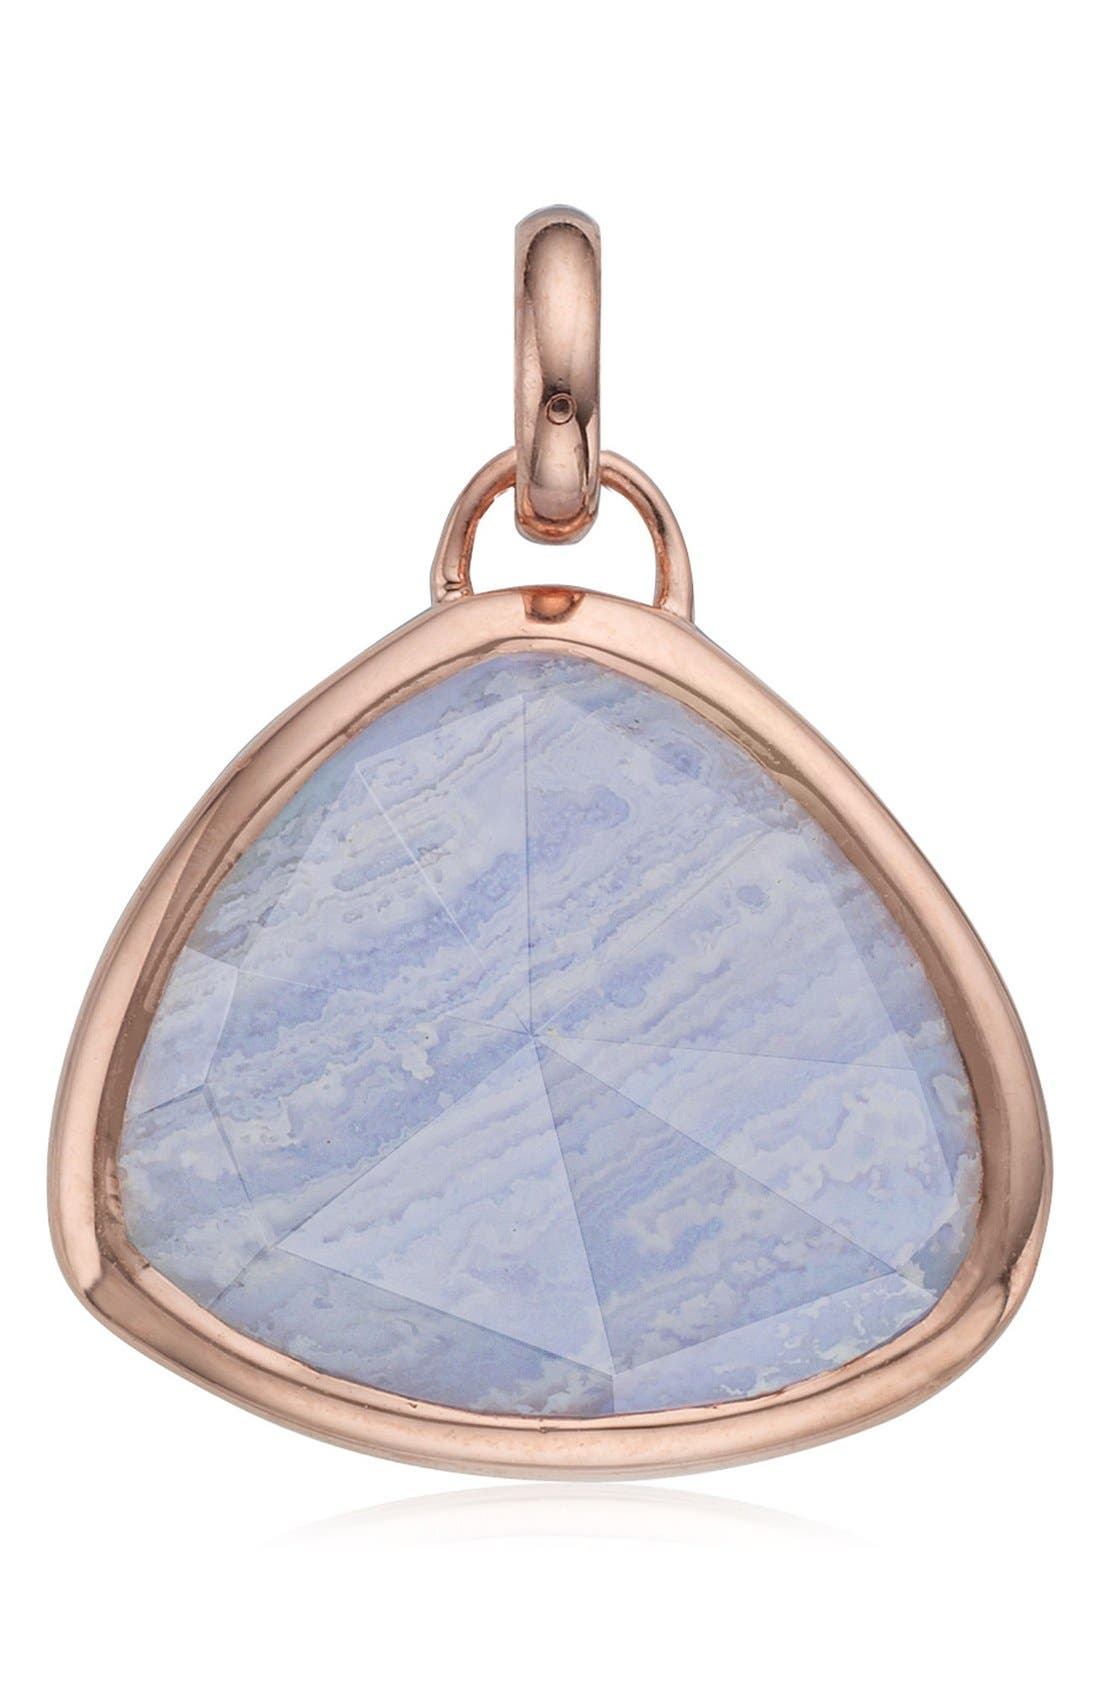 Siren Semiprecious Stone Pendant,                             Main thumbnail 1, color,                             Rose Gold